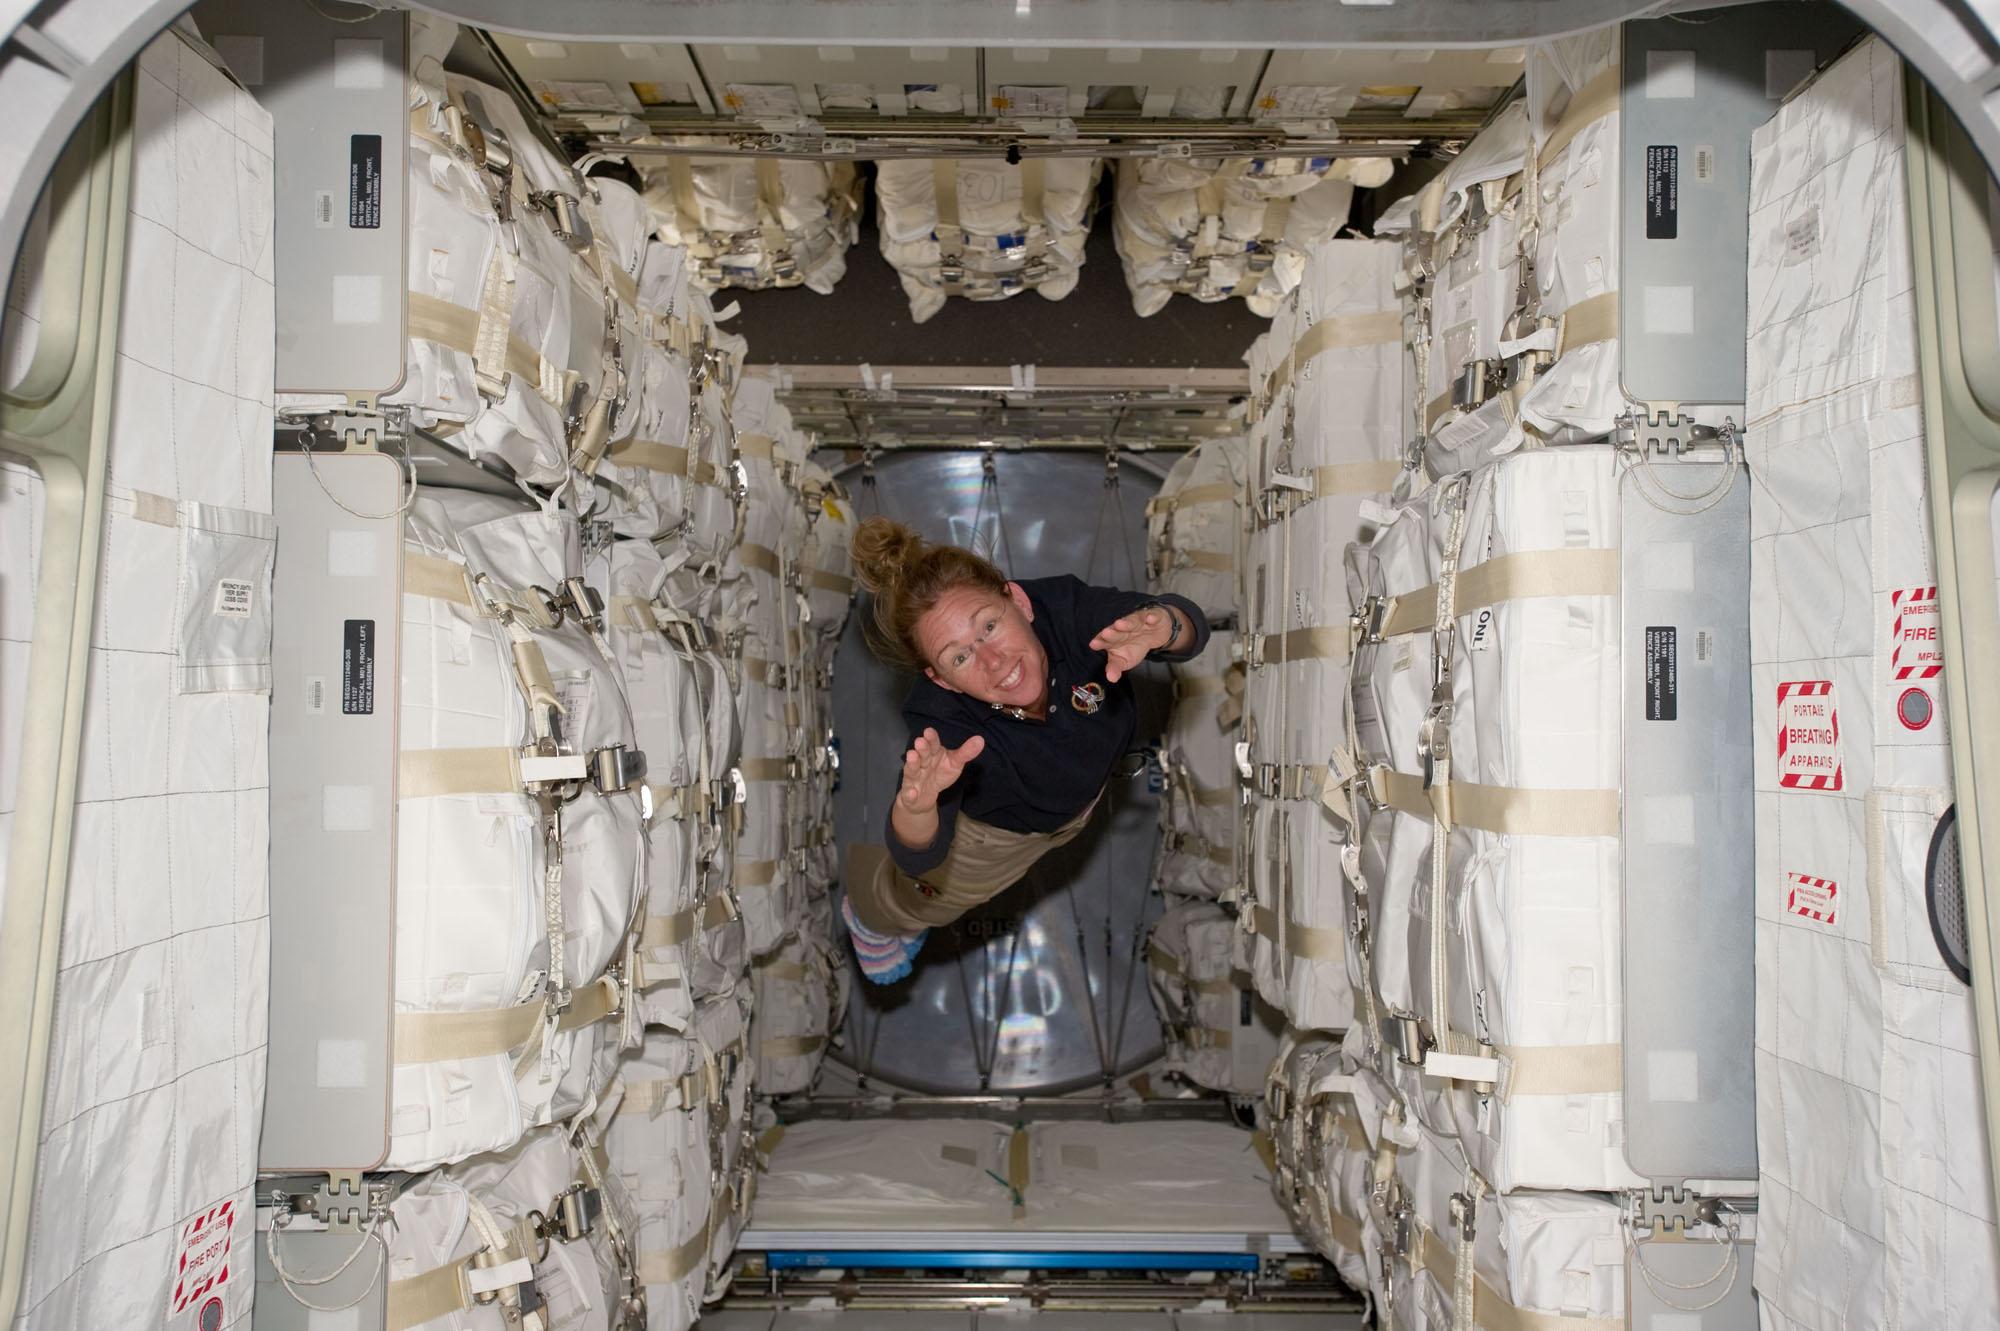 Astronauts Unpack Giant Space Locker in Orbit